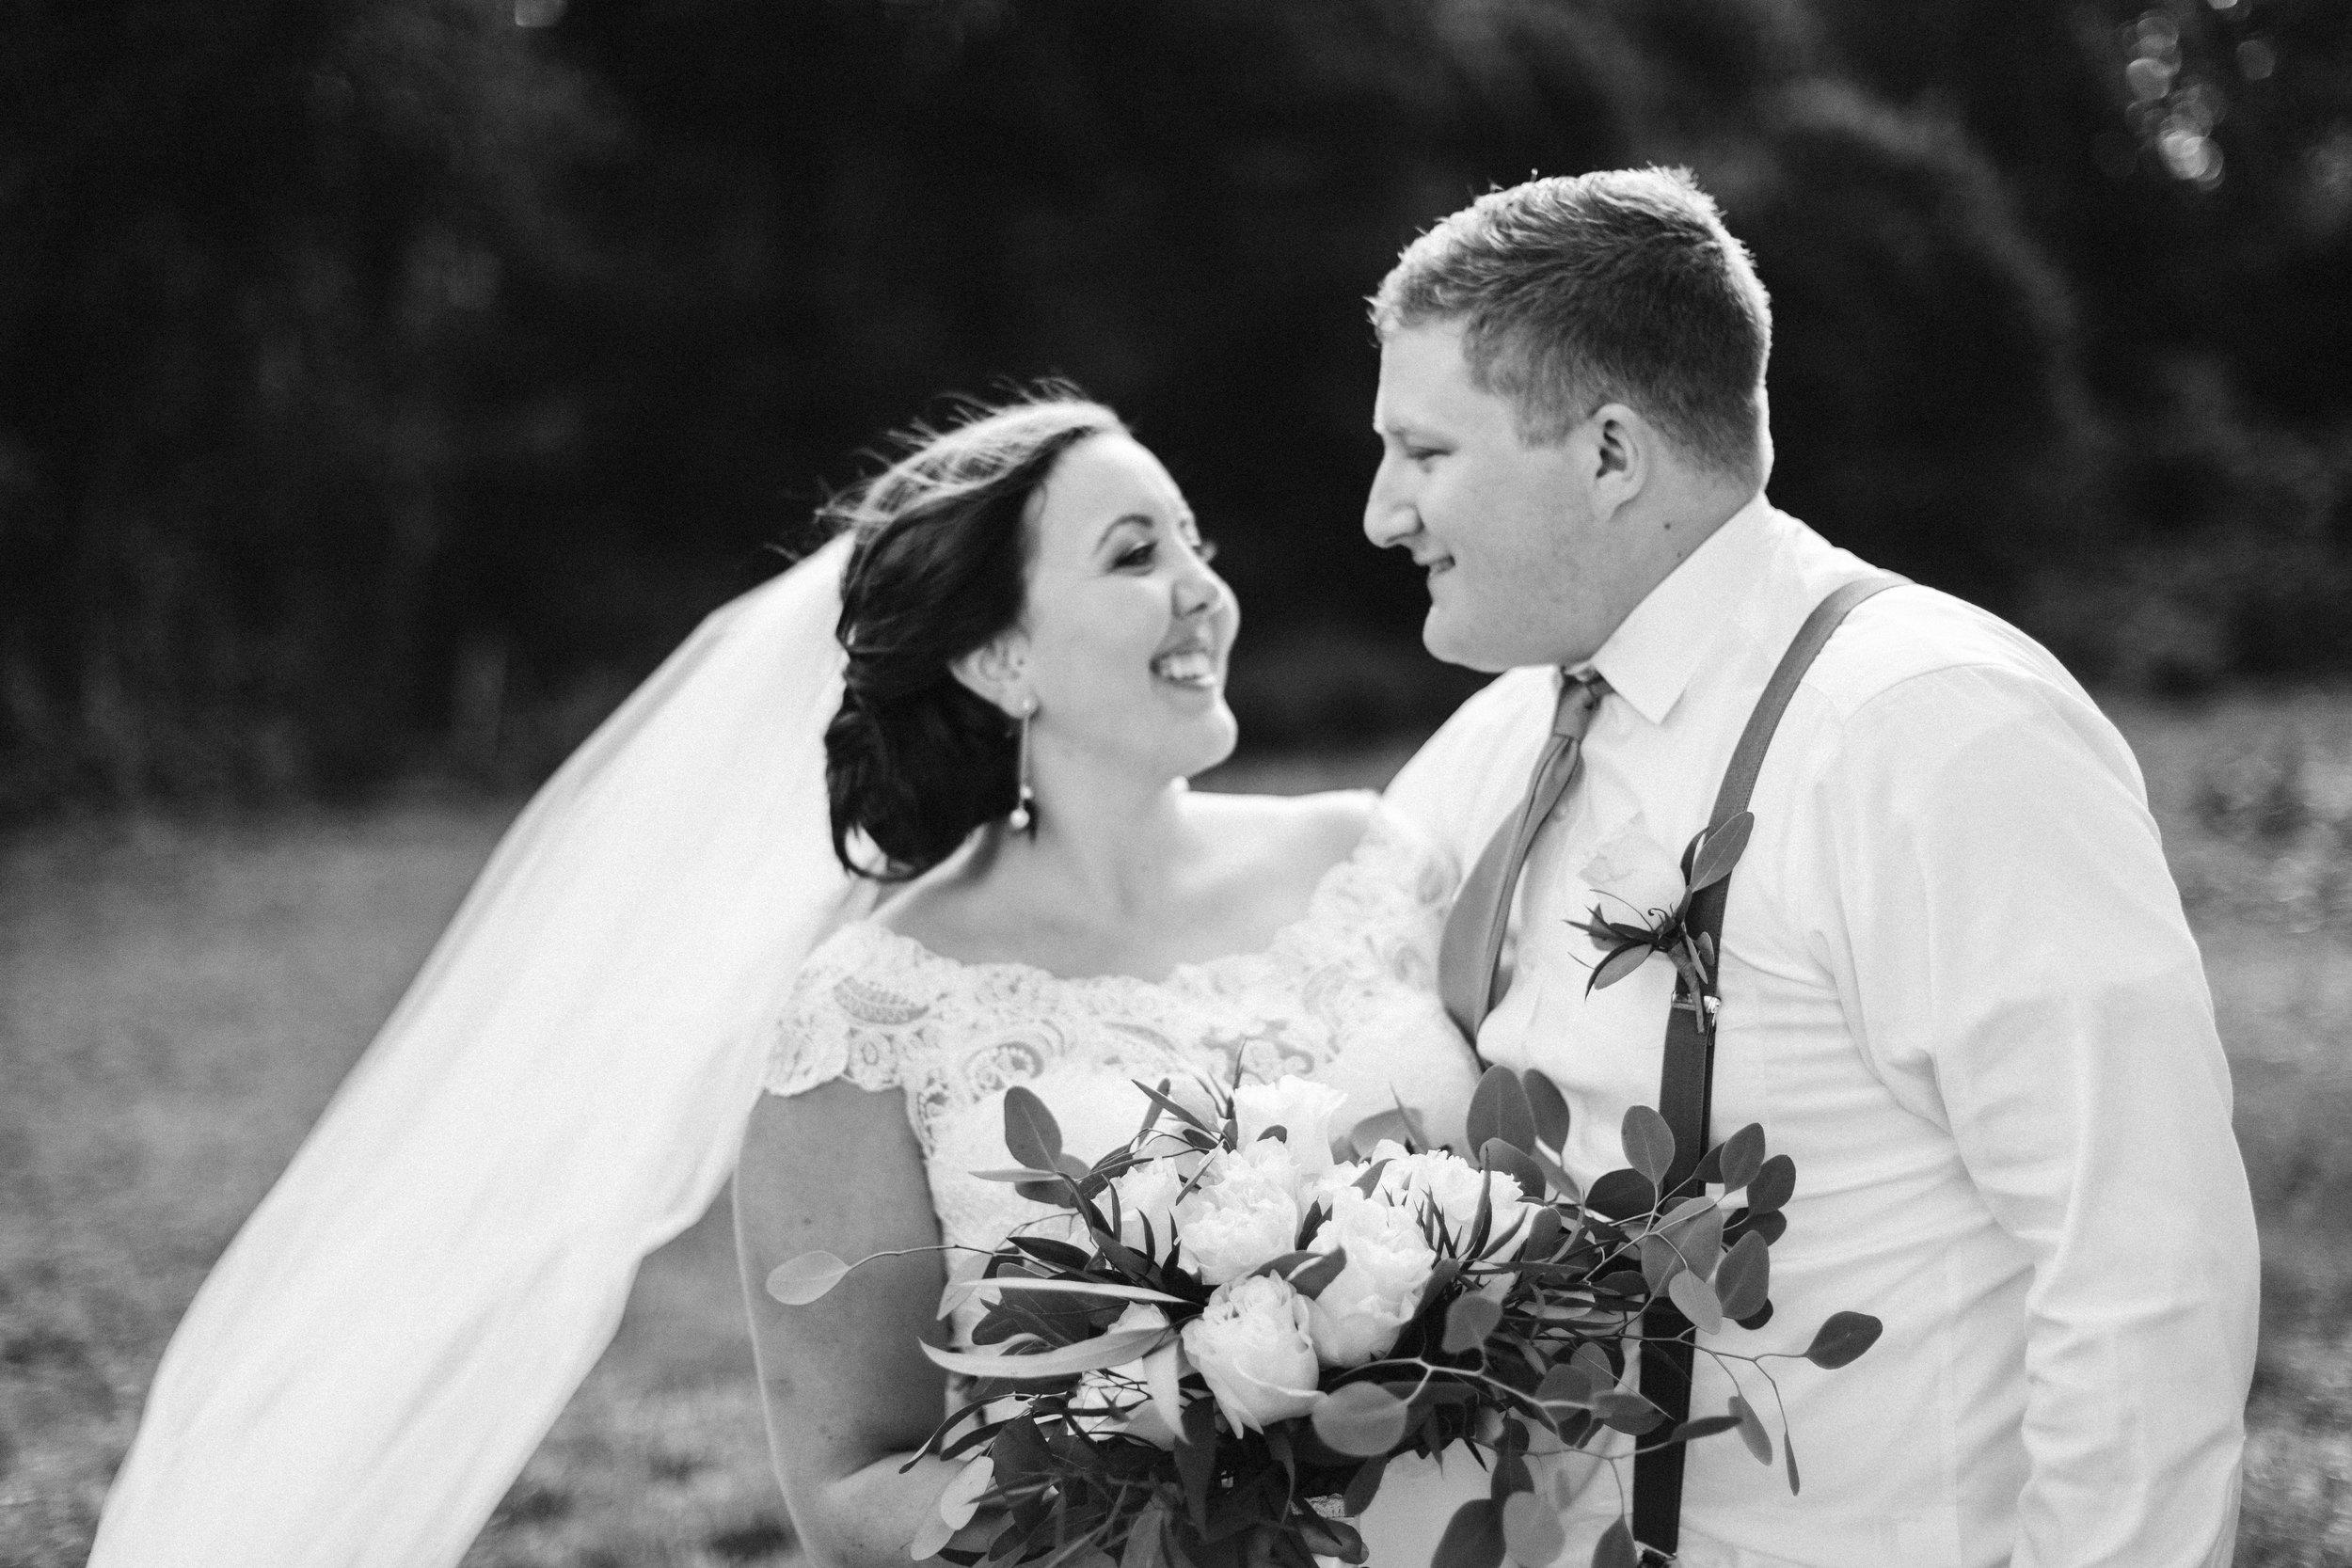 Griffin Wedding October Oaks Farm-430.jpg